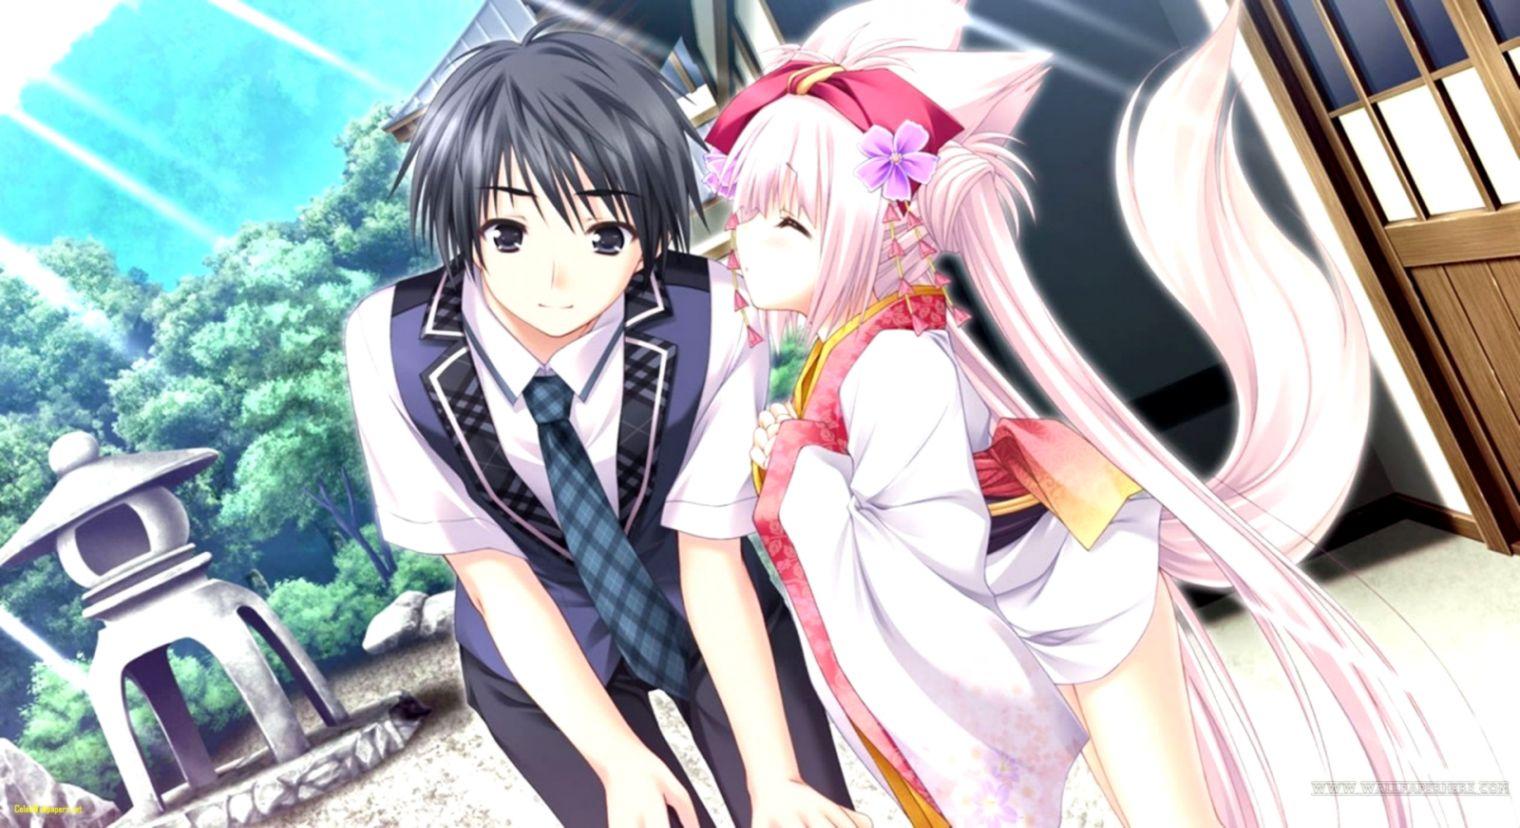 Cute Anime Couple Wallpaper Hd Wallpapers Jobs